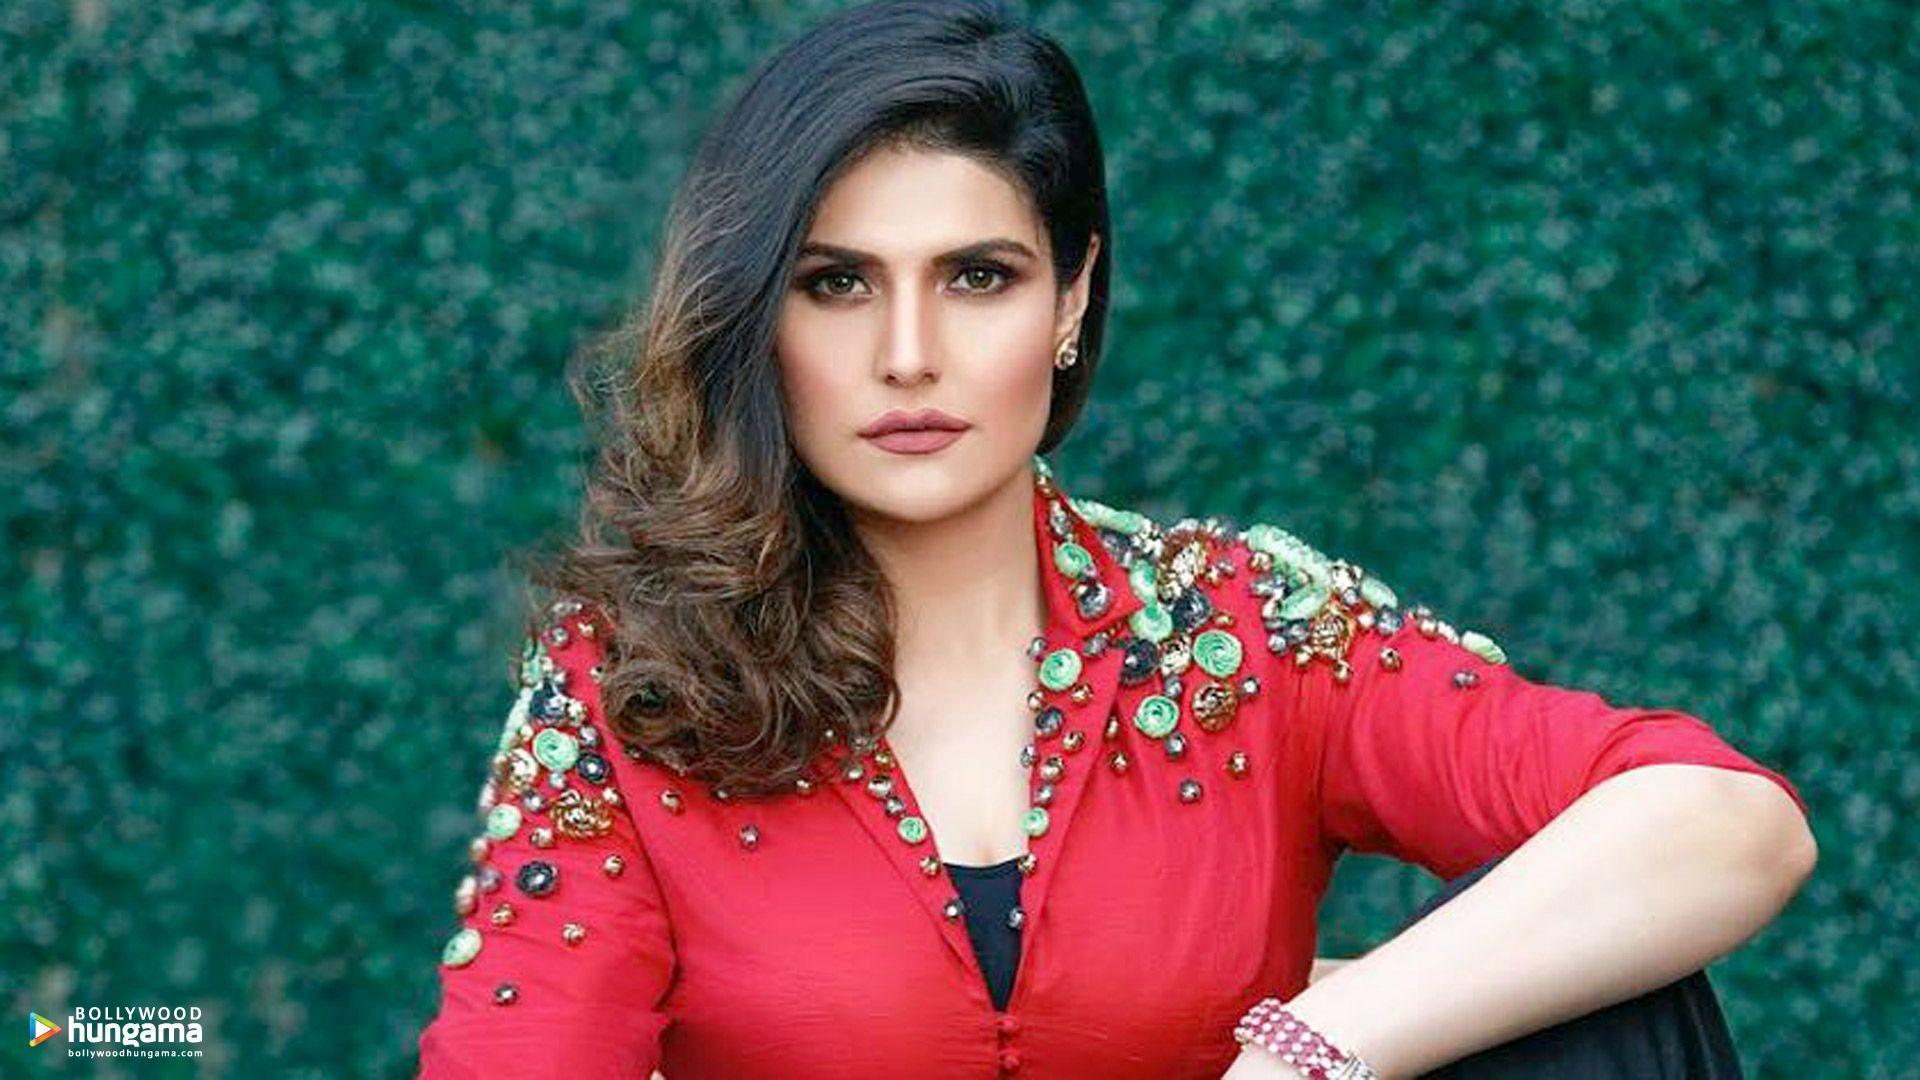 S. D. K videos: zarine khan hd wallpapers free download.